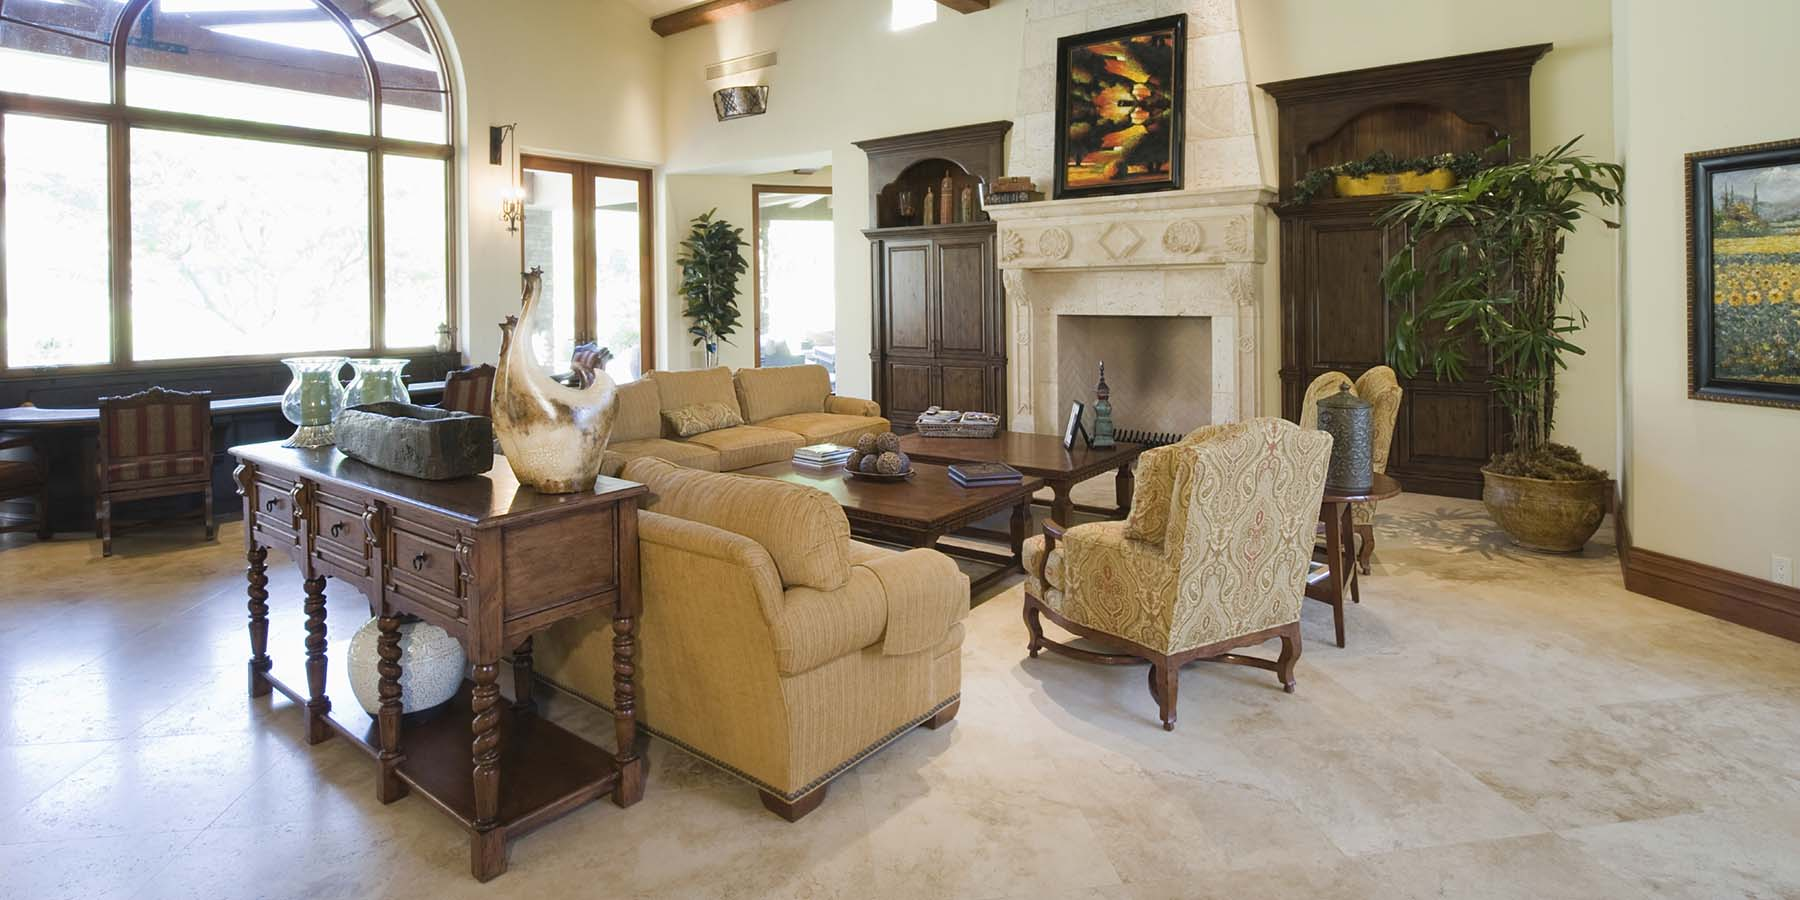 Cornerstone Real Estate Professionals